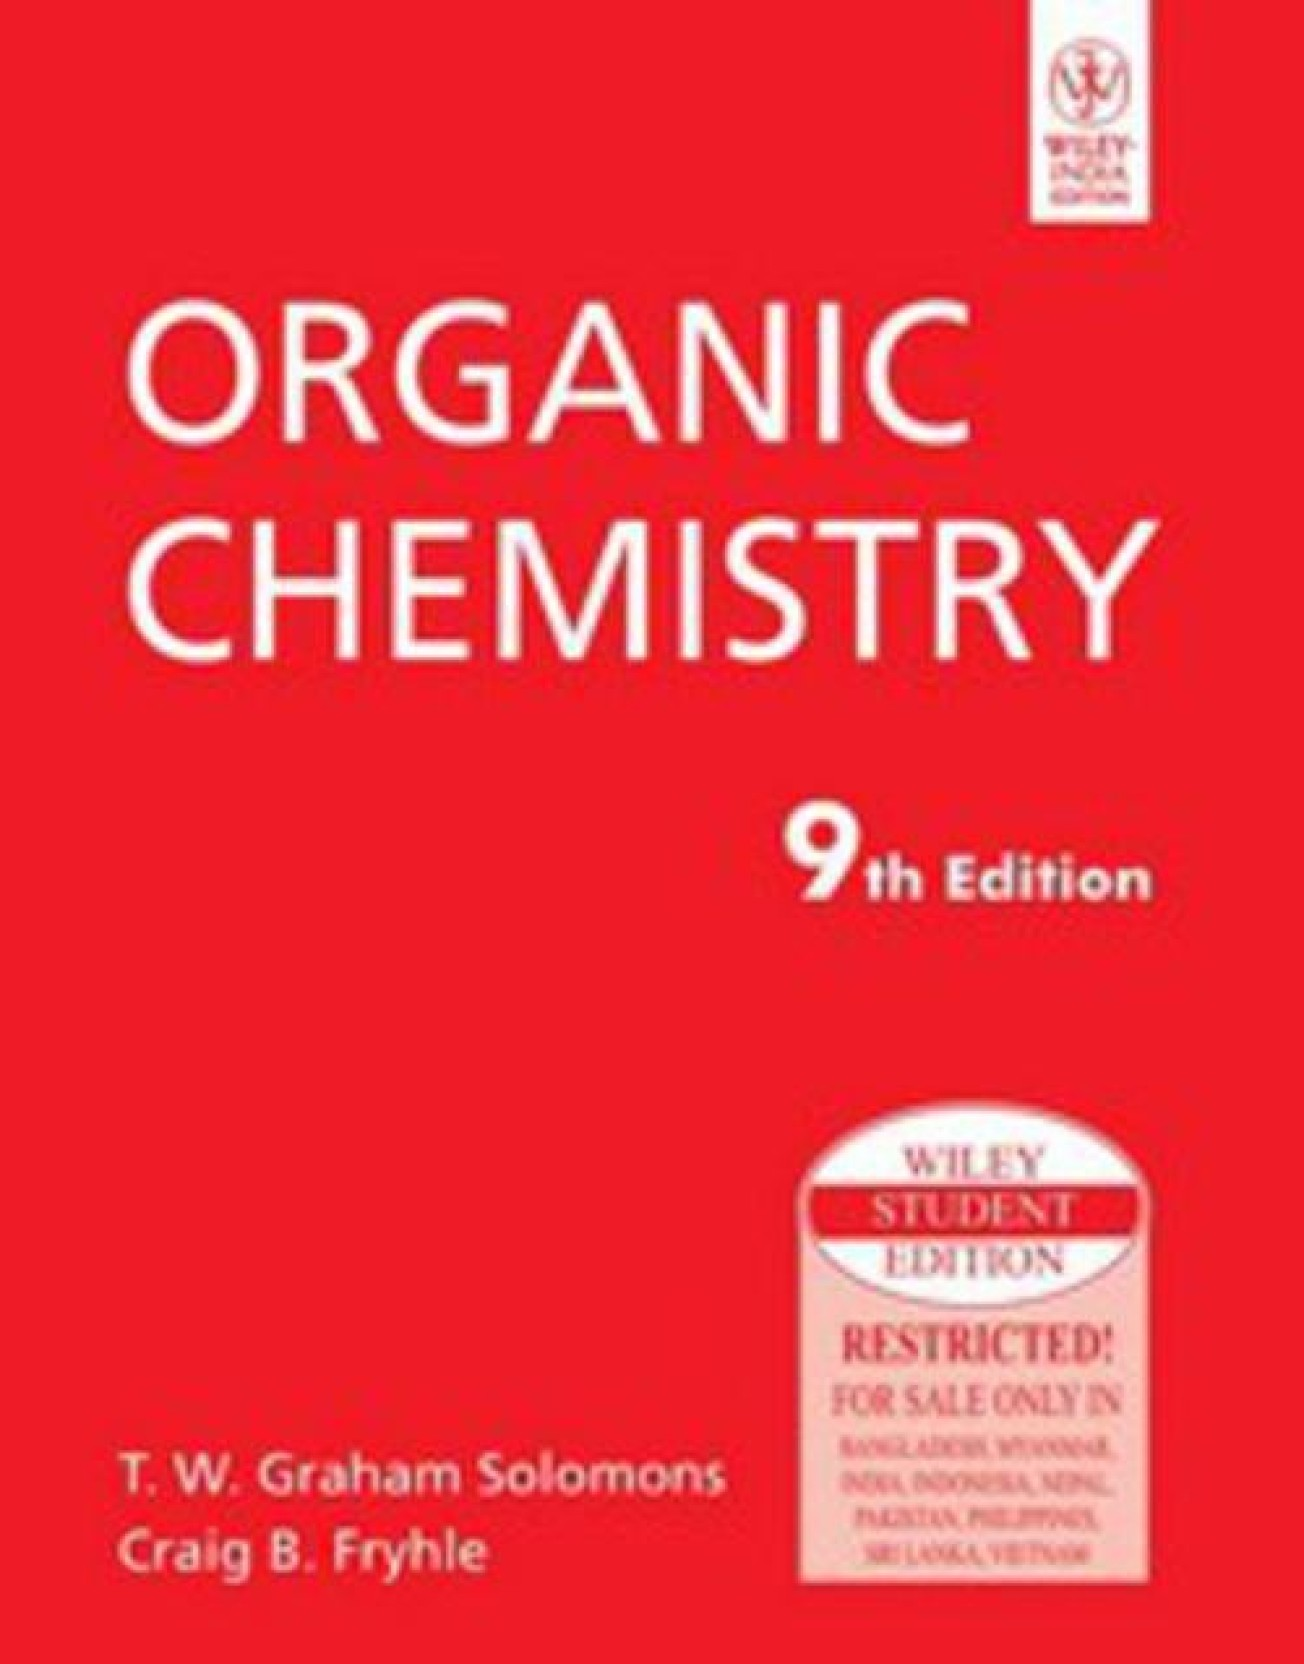 Organic Chemistry 9 Edition. Home